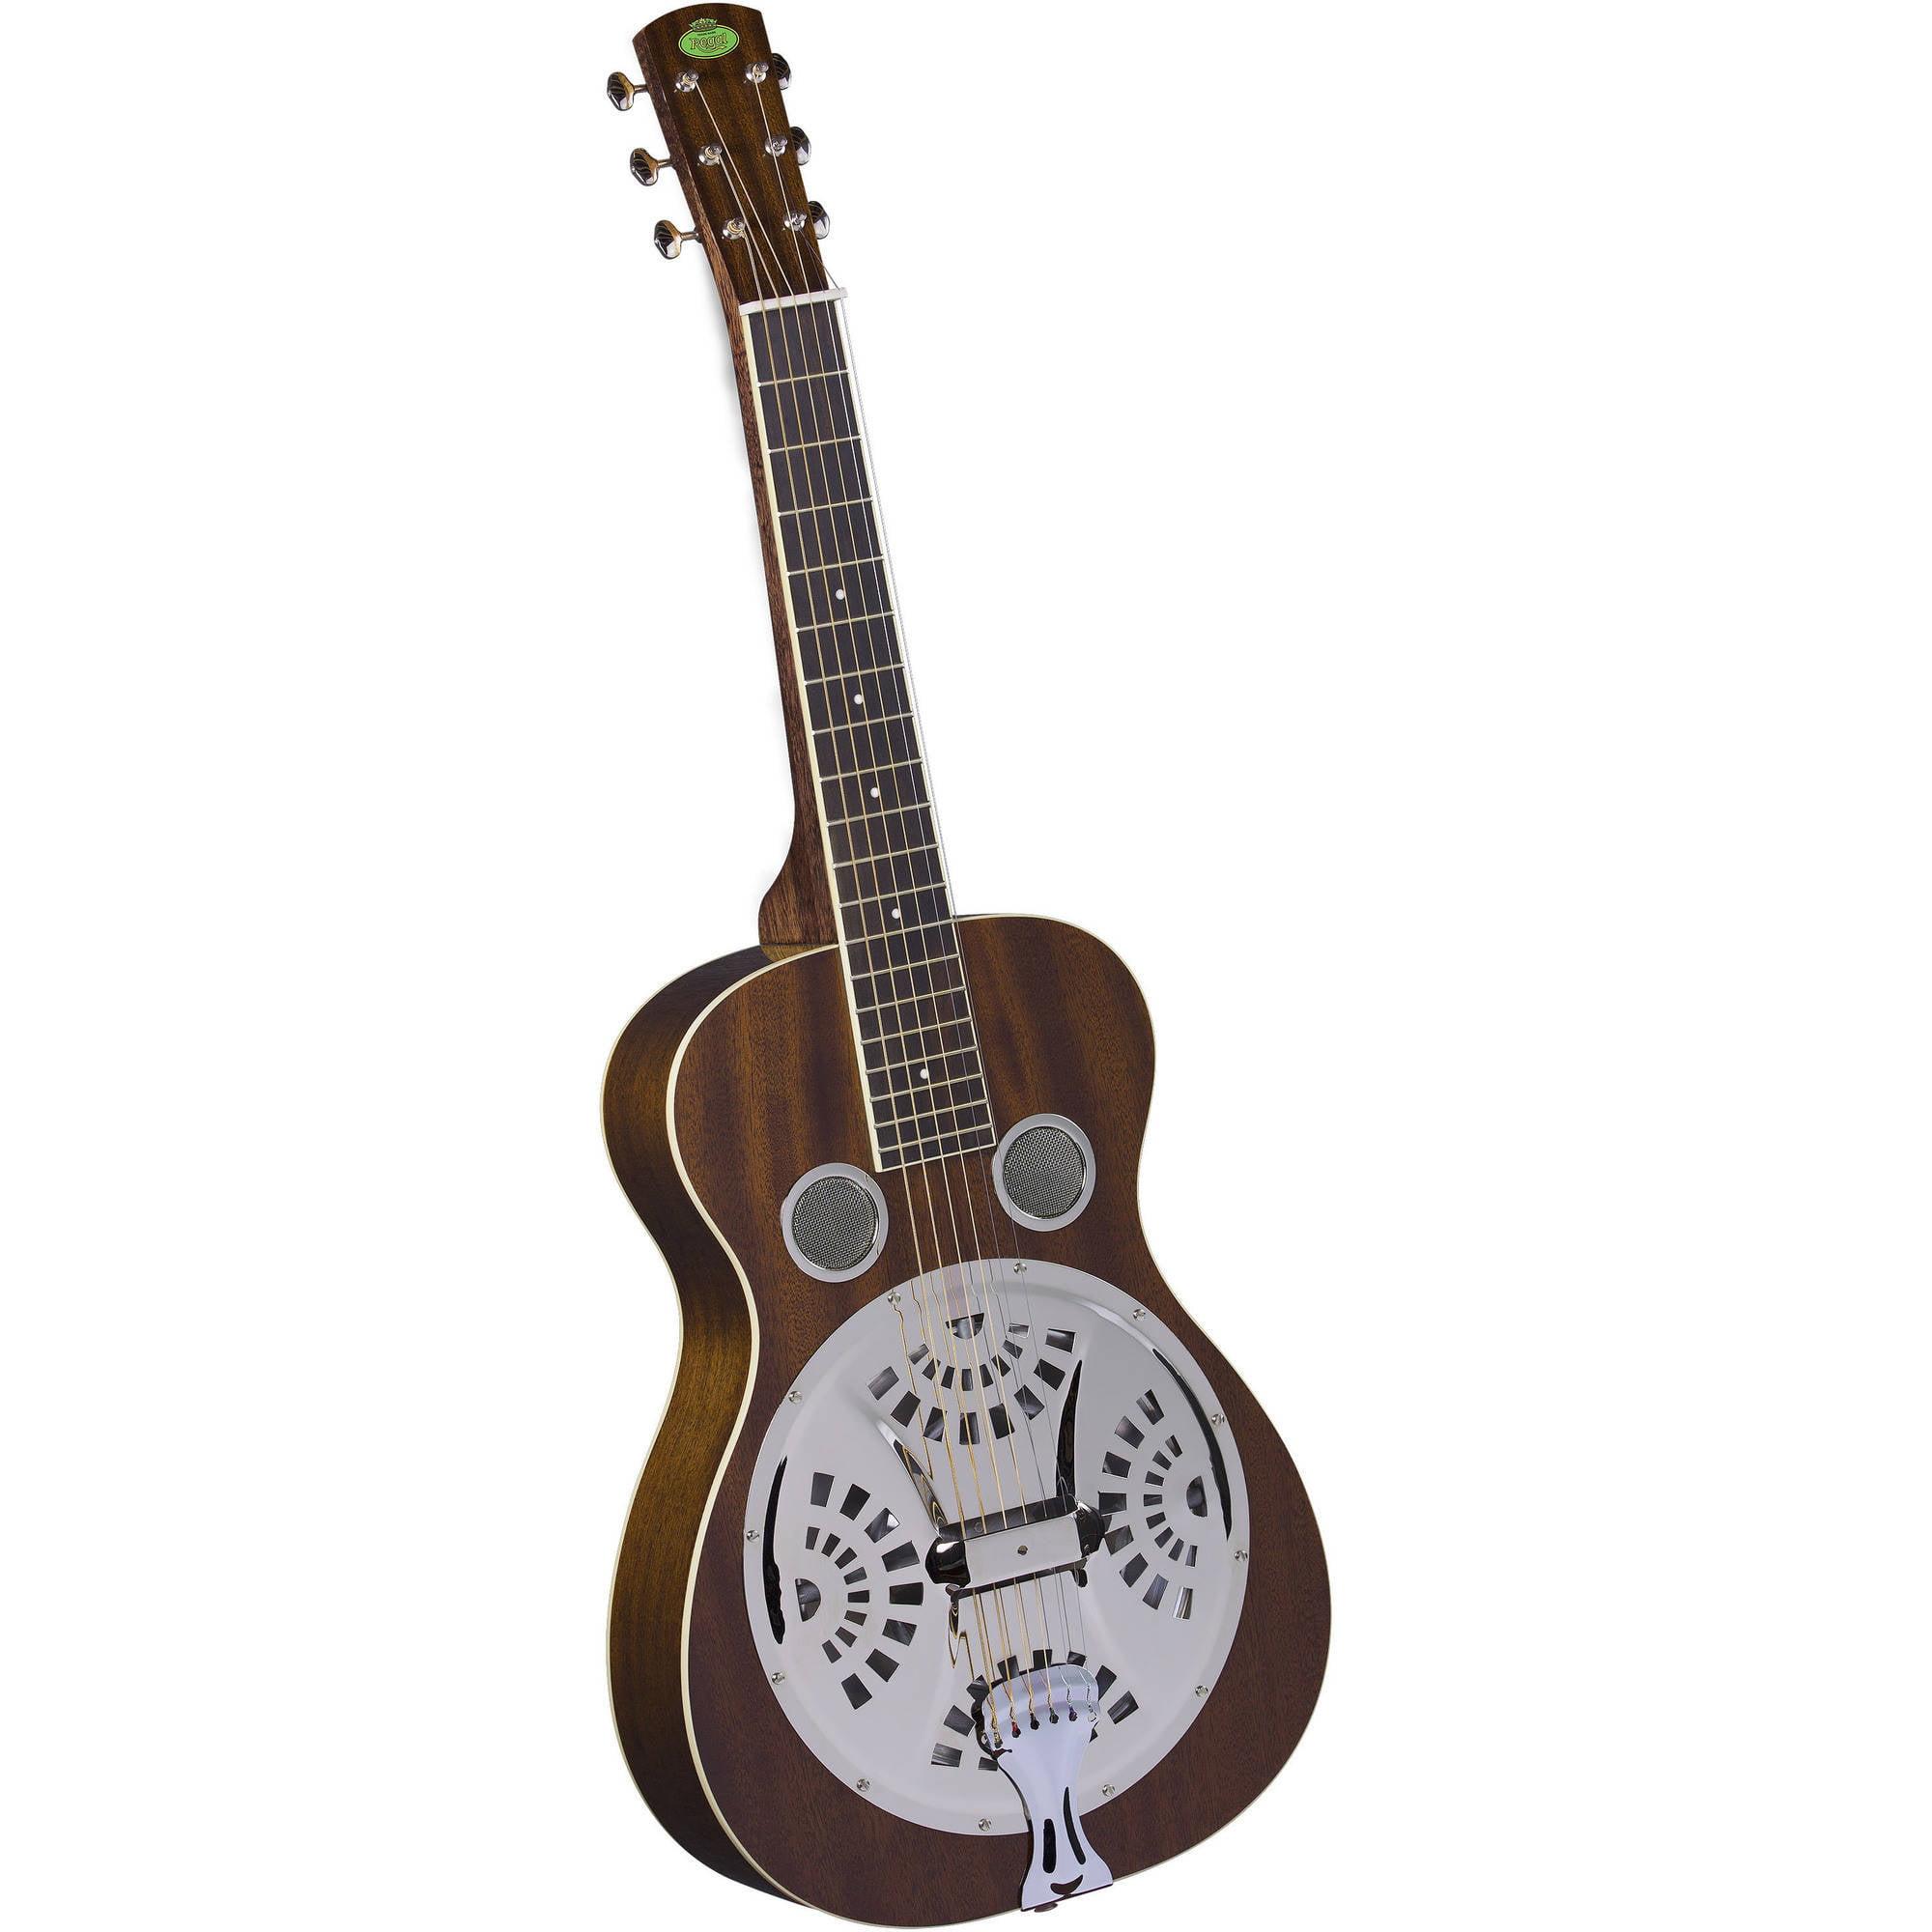 Regal RD-30MS Studio Series Squareneck Resophonic Guitar, Natural Mahogany by Saga Musical Instruments